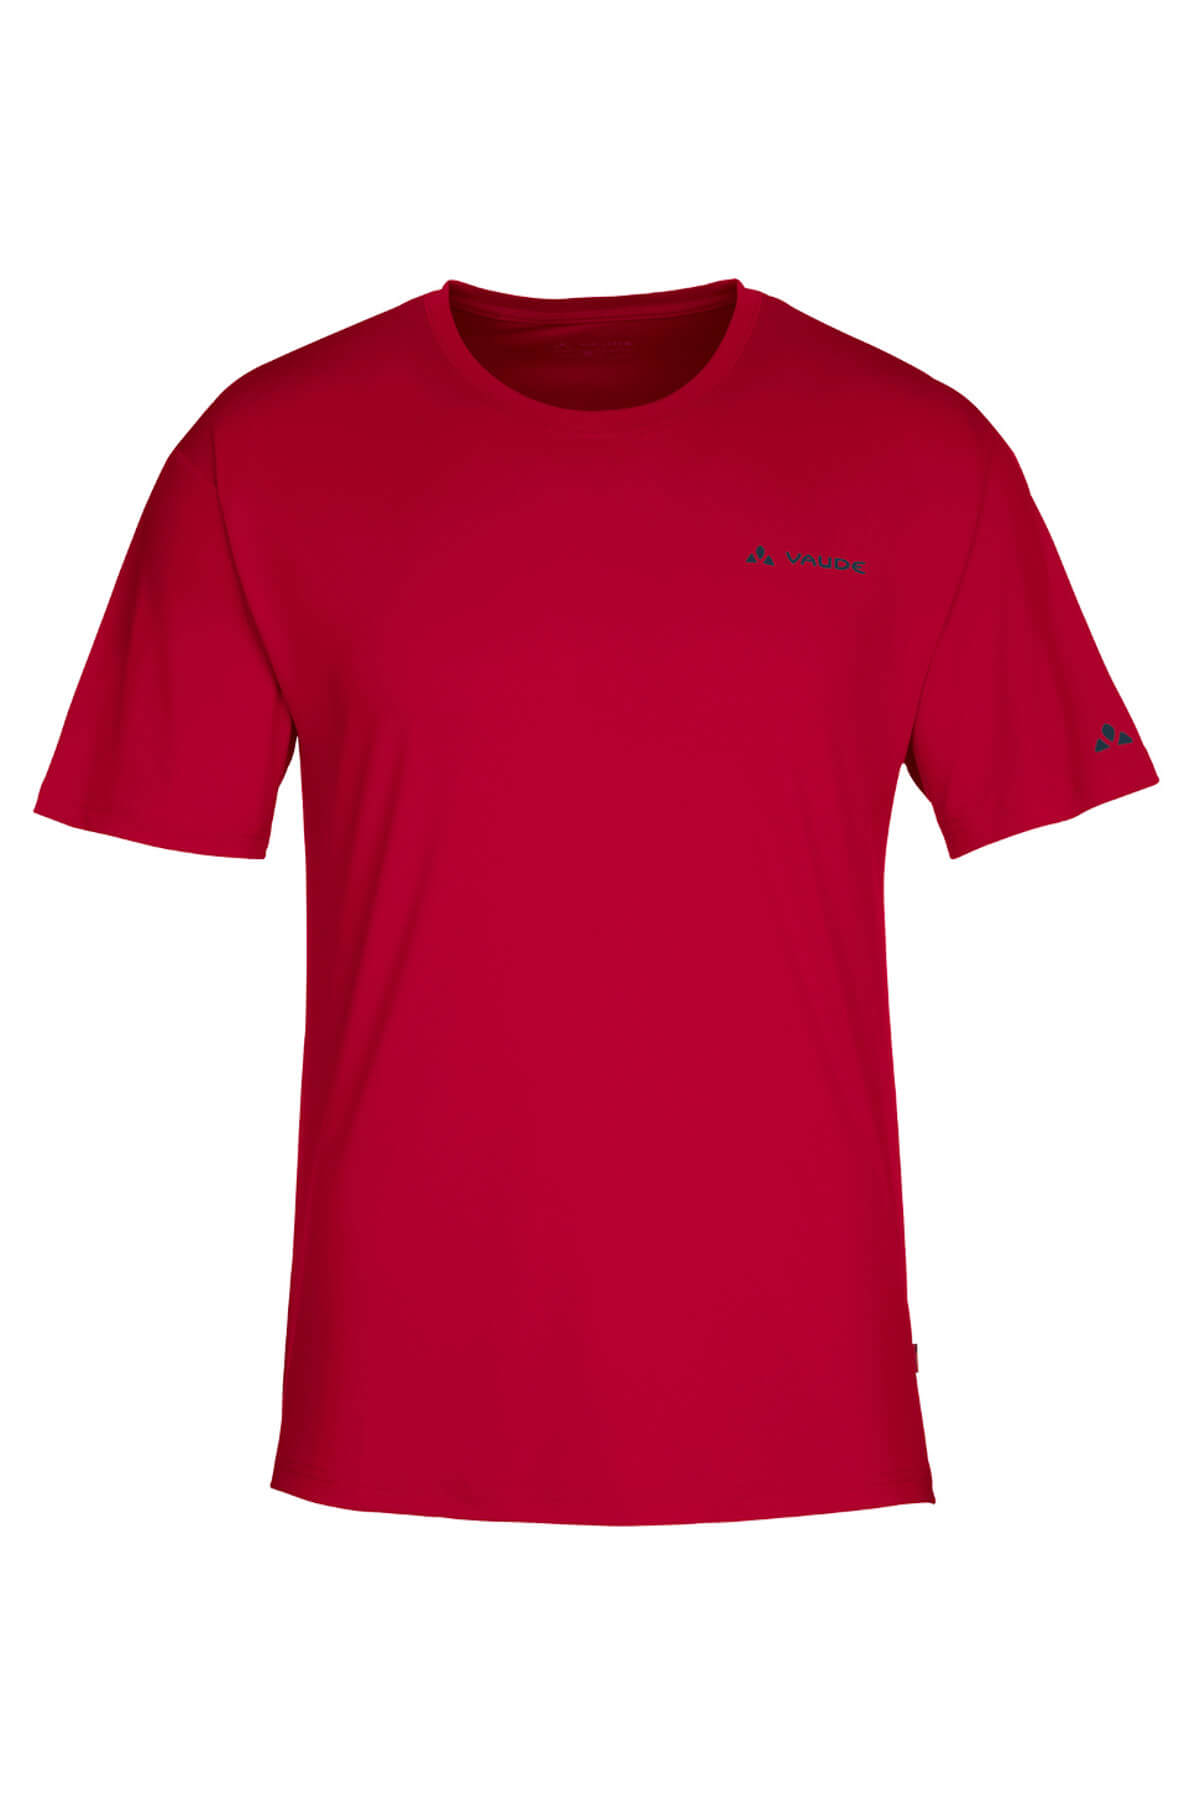 VAUDE Micro Big Fritz III Erkek T-Shirt 05061 1